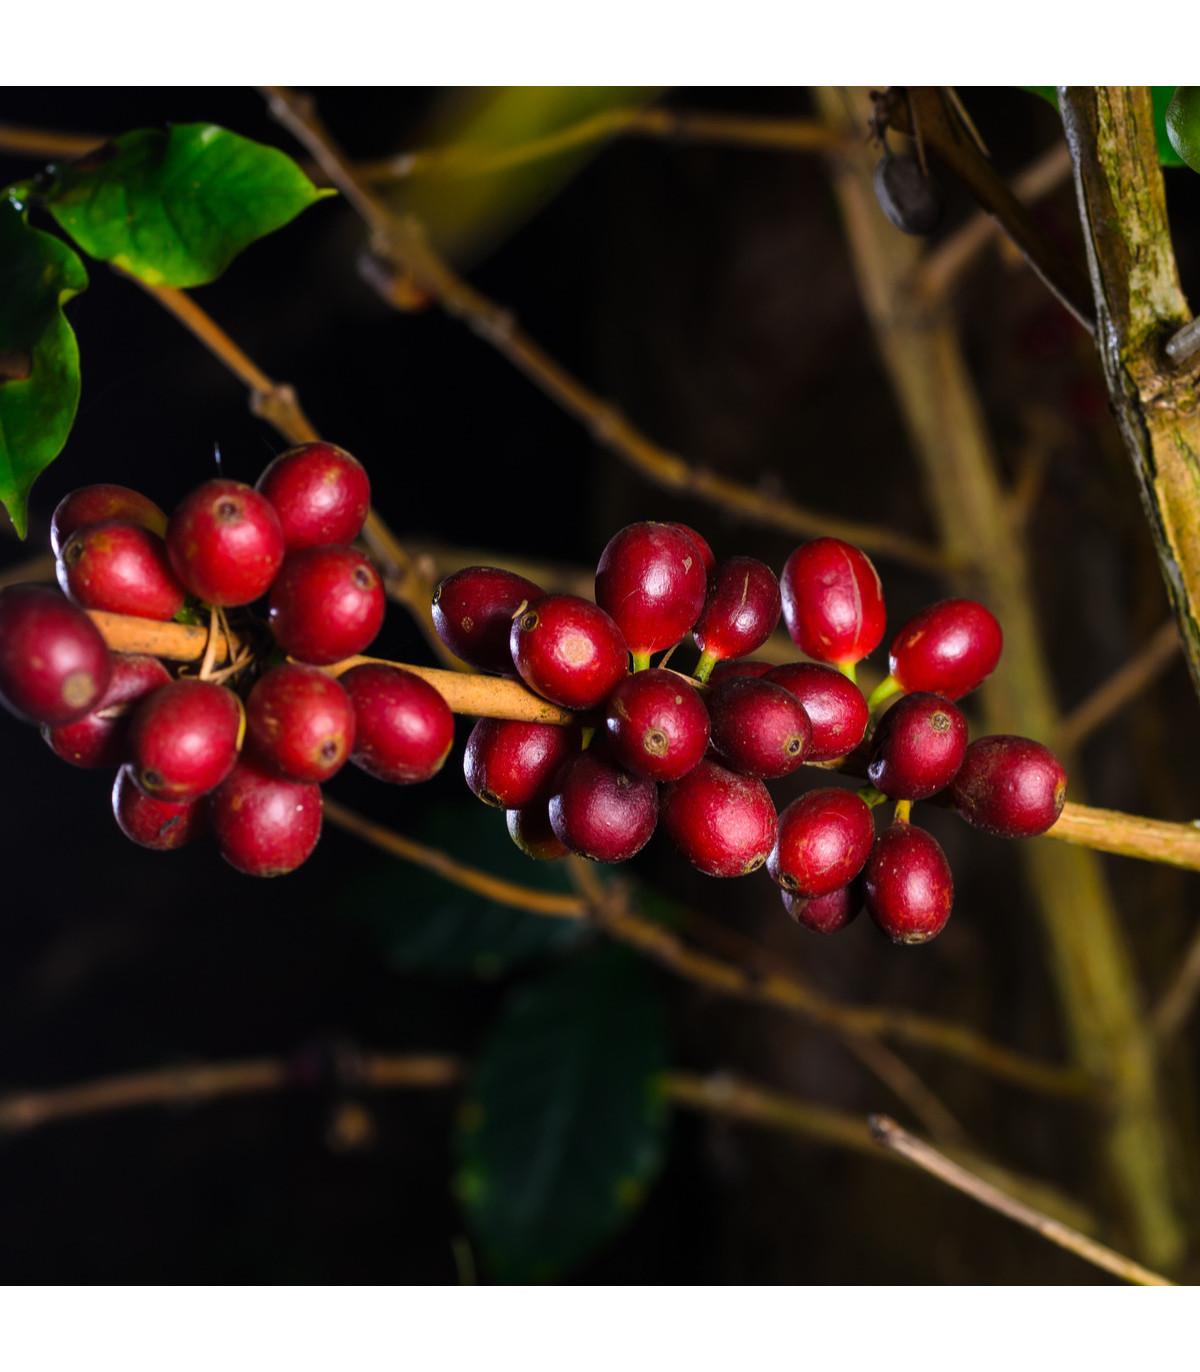 Kávovník hawajský - Konna - Coffea konna - semena kávovníku - 5 ks